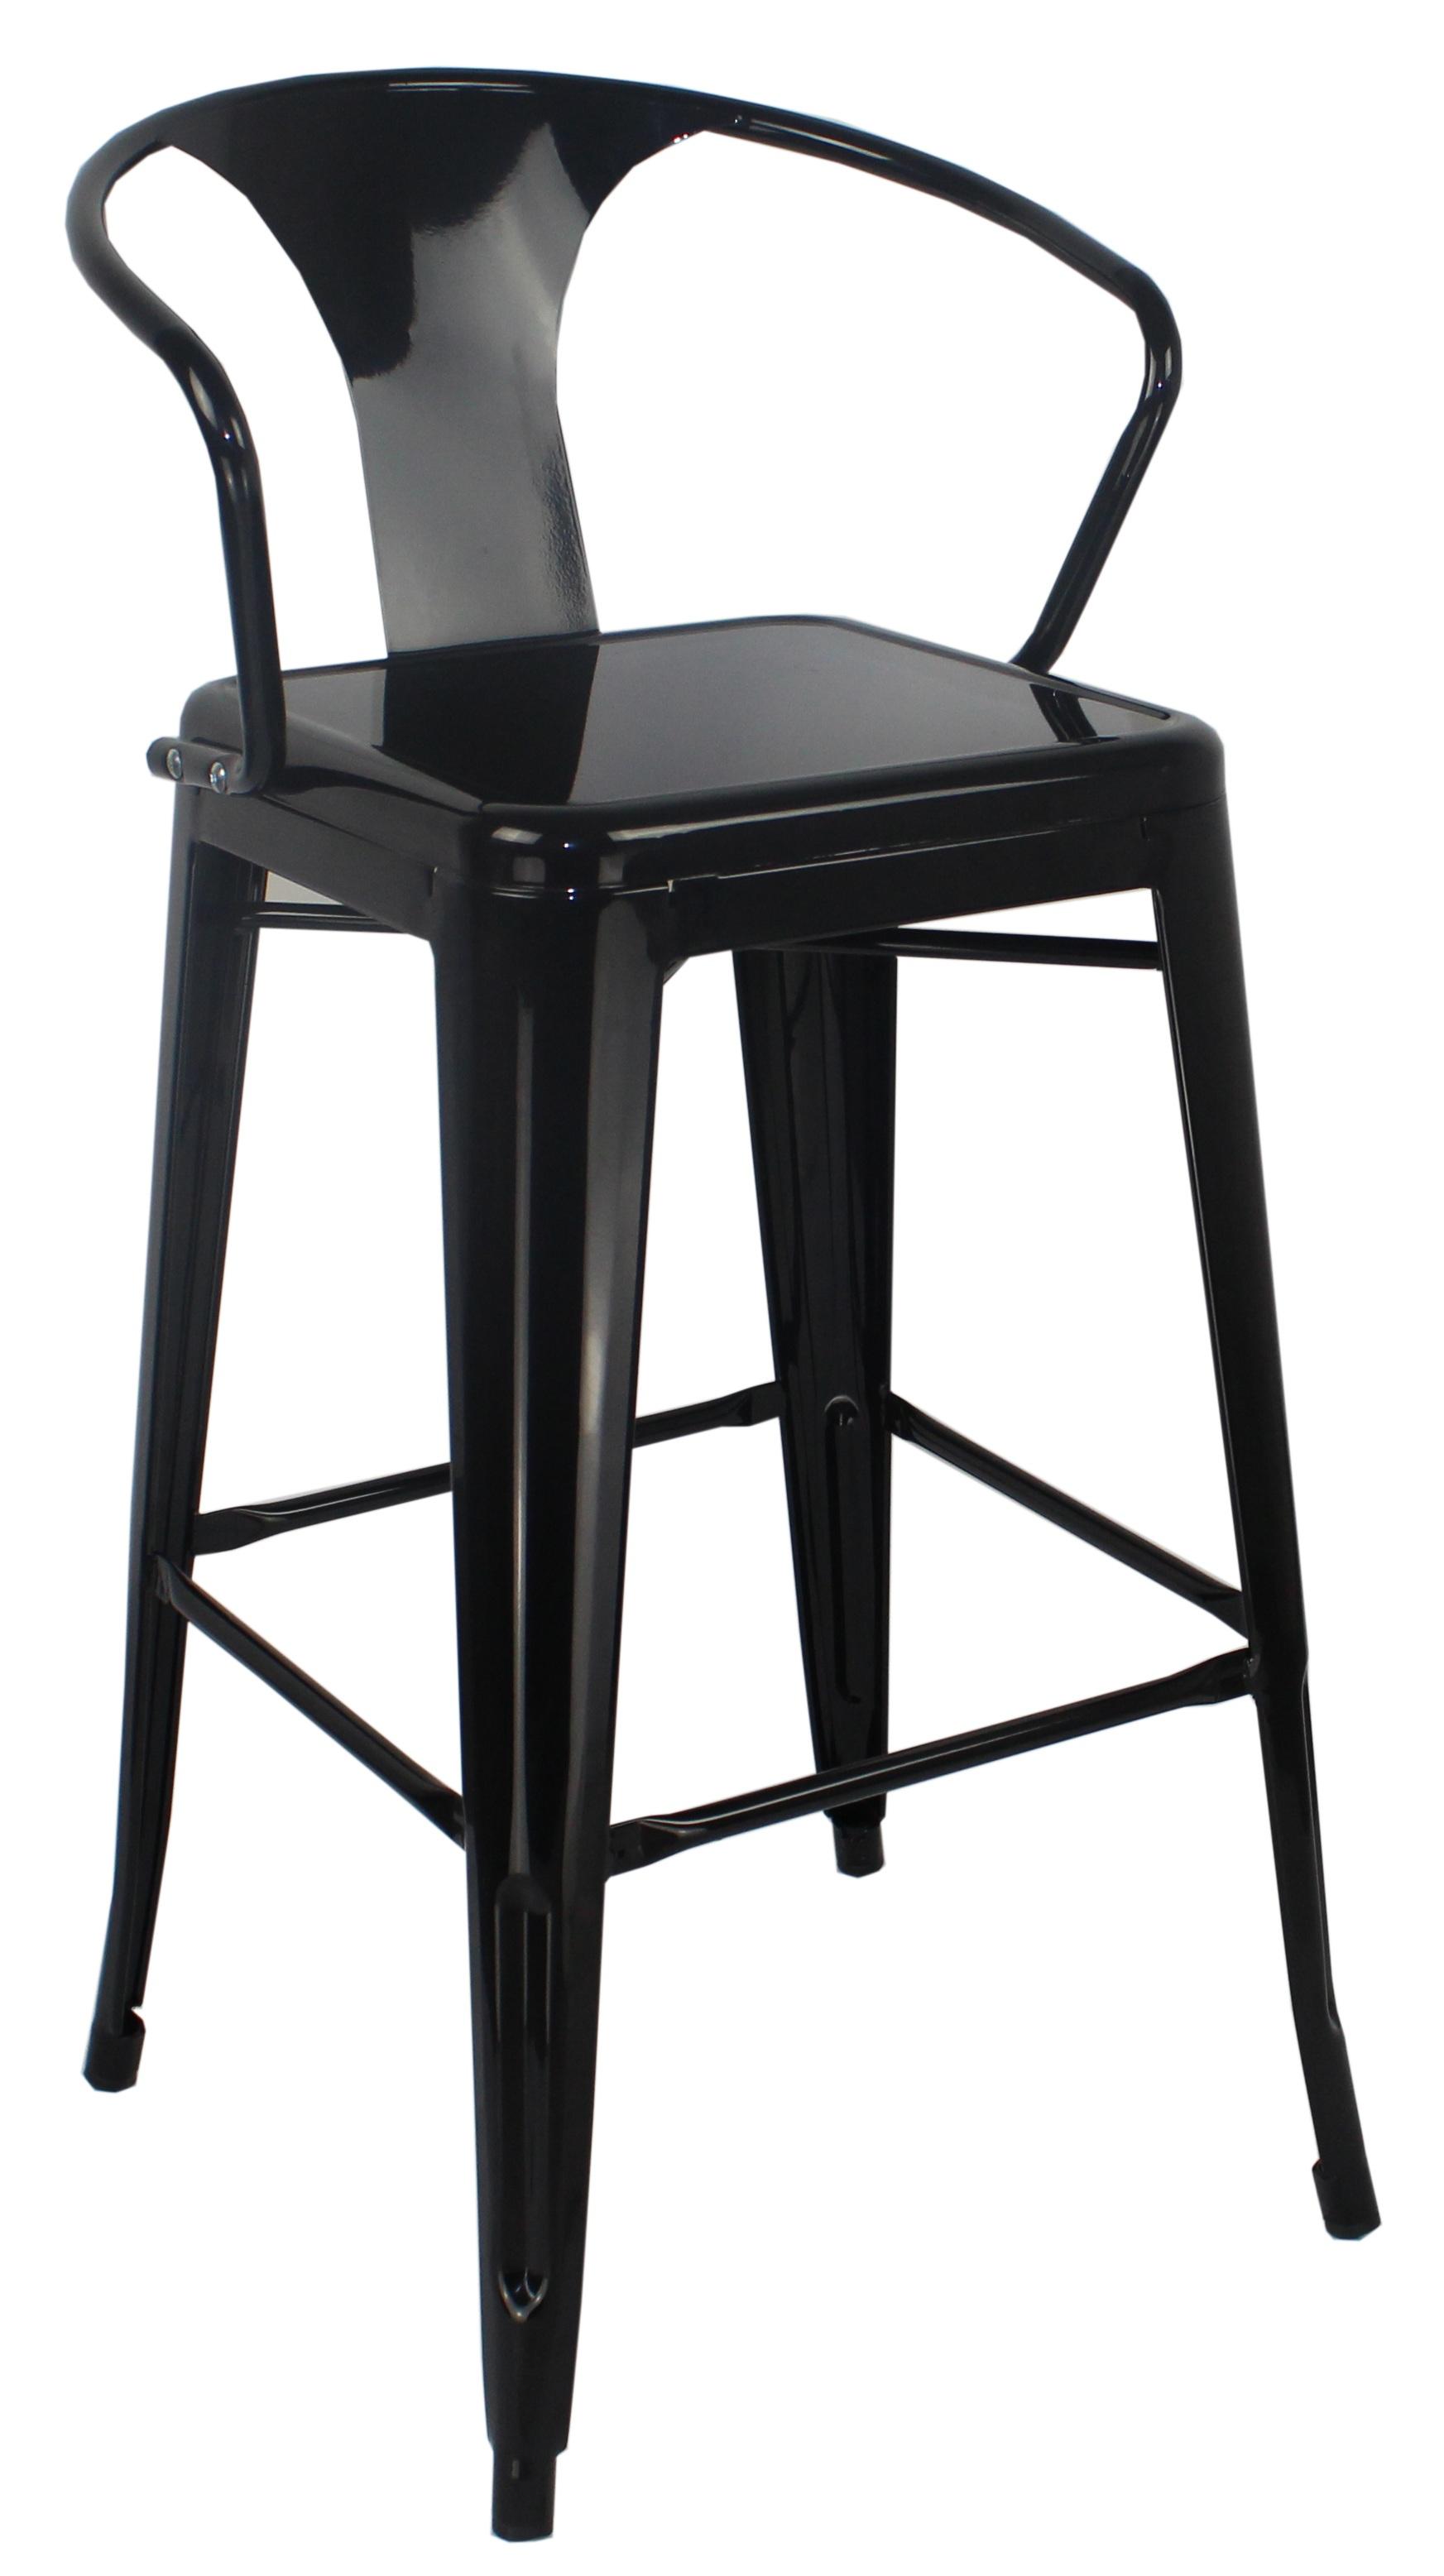 Metal Bar chair Manufacturer